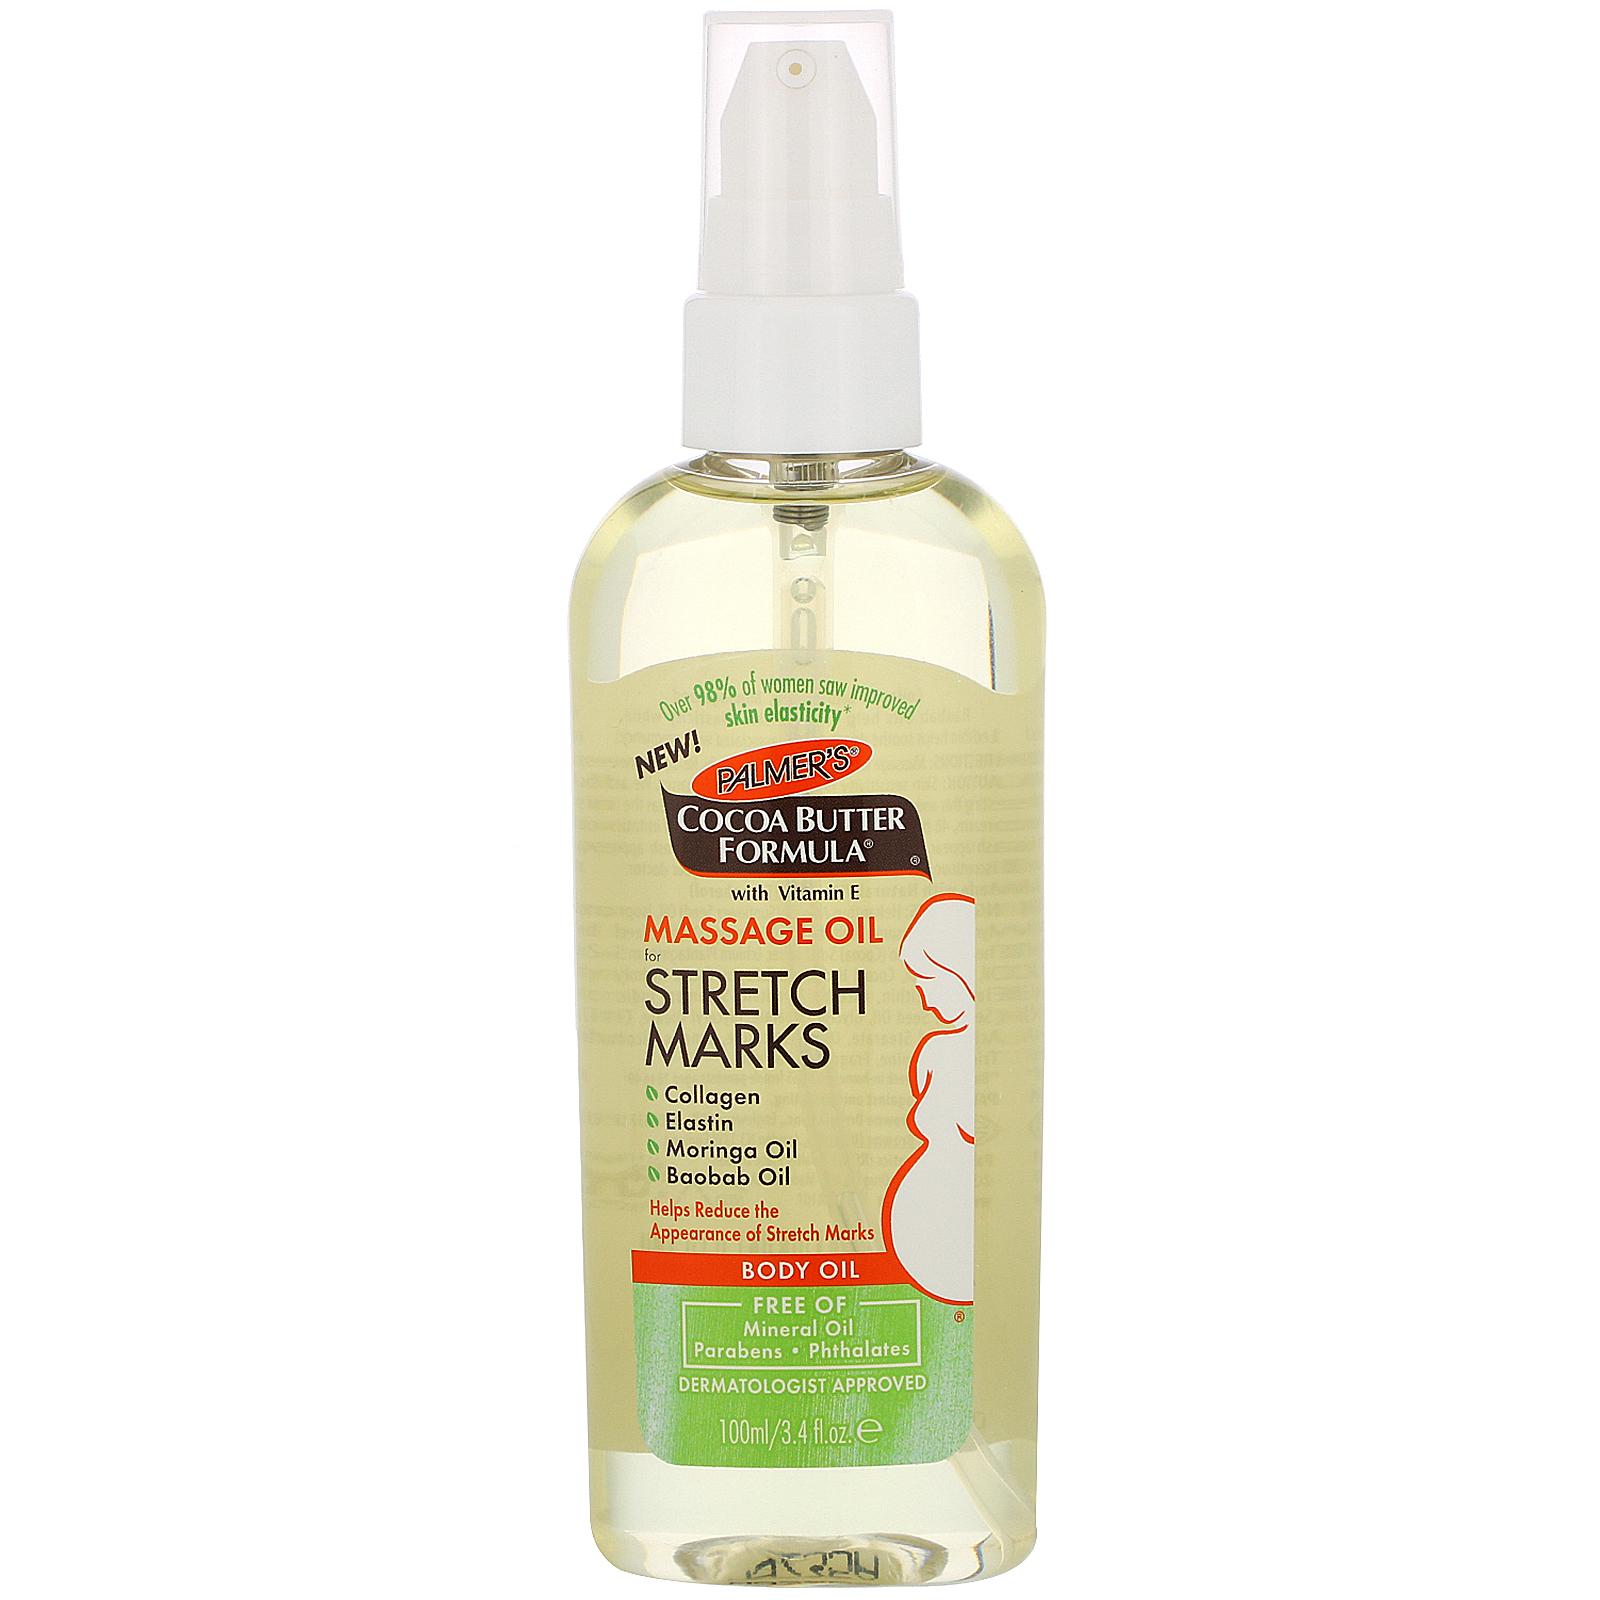 Palmer's, Cocoa Butter Formula, Massage Body Oil for Stretch Marks, 3.4 fl  oz (100 ml) - iHerb